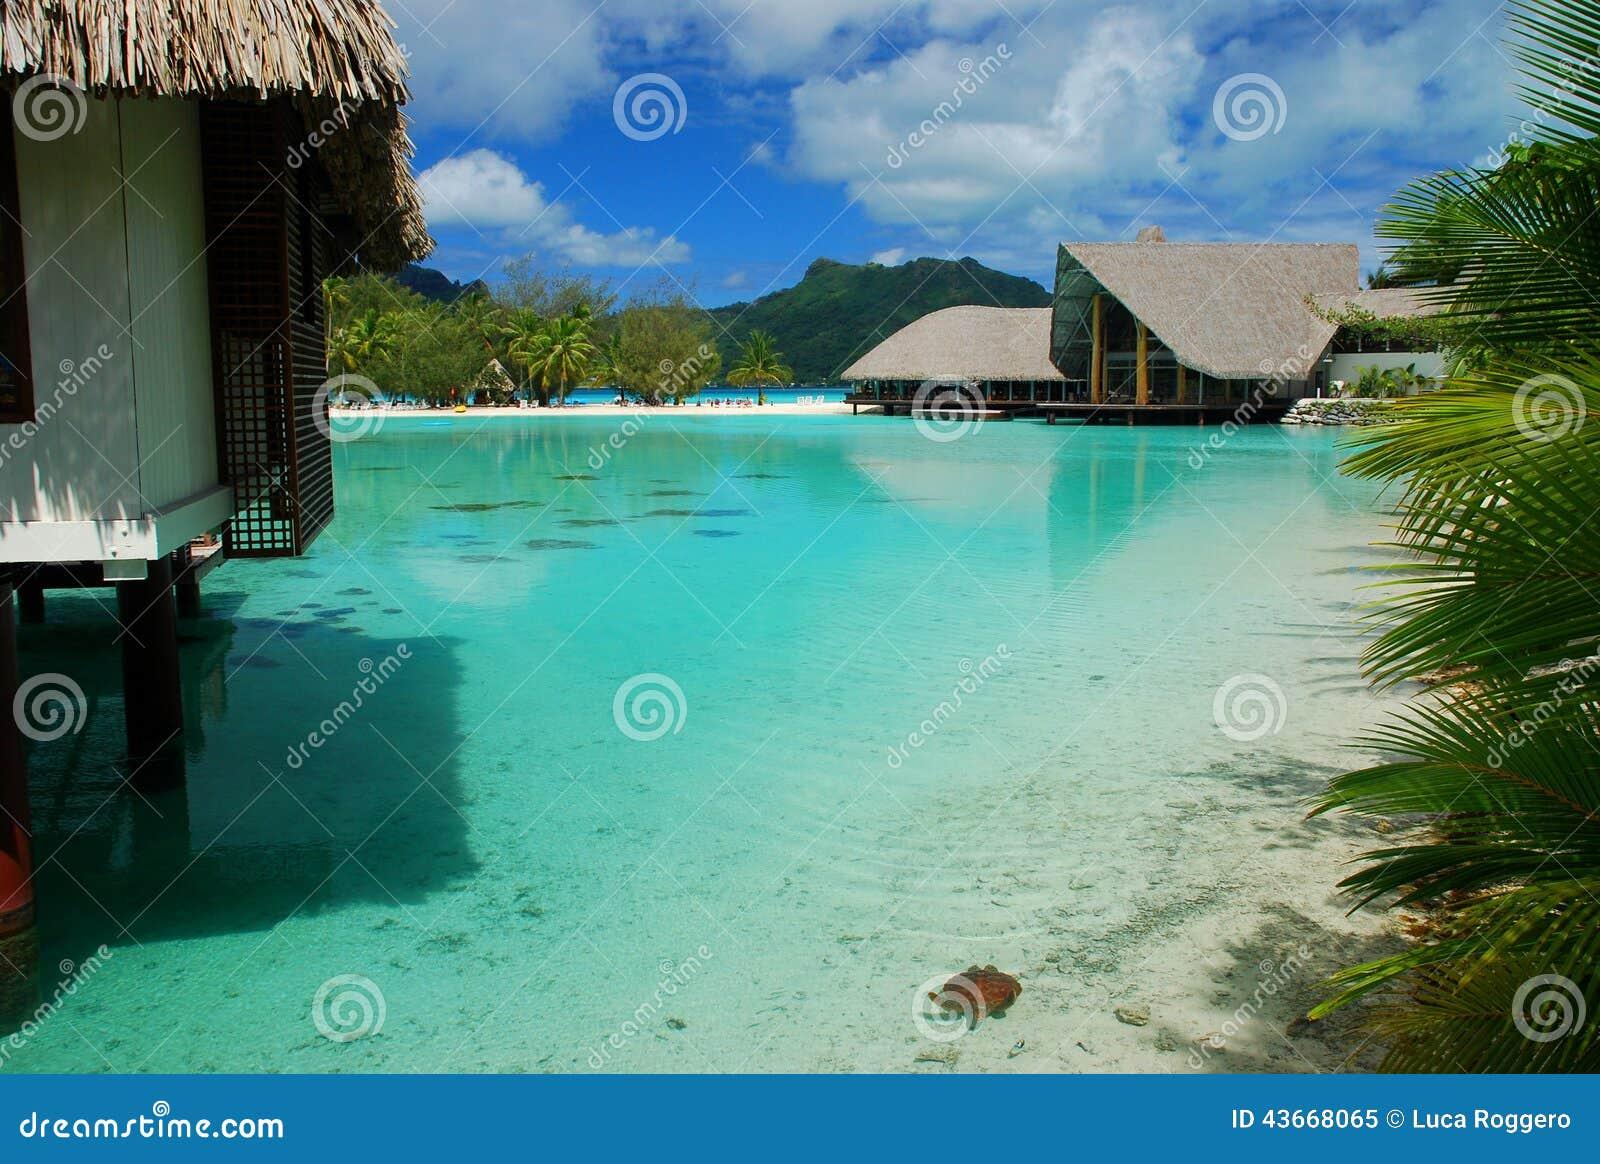 Centro turístico turístico Bora Bora, Polinesia francesa